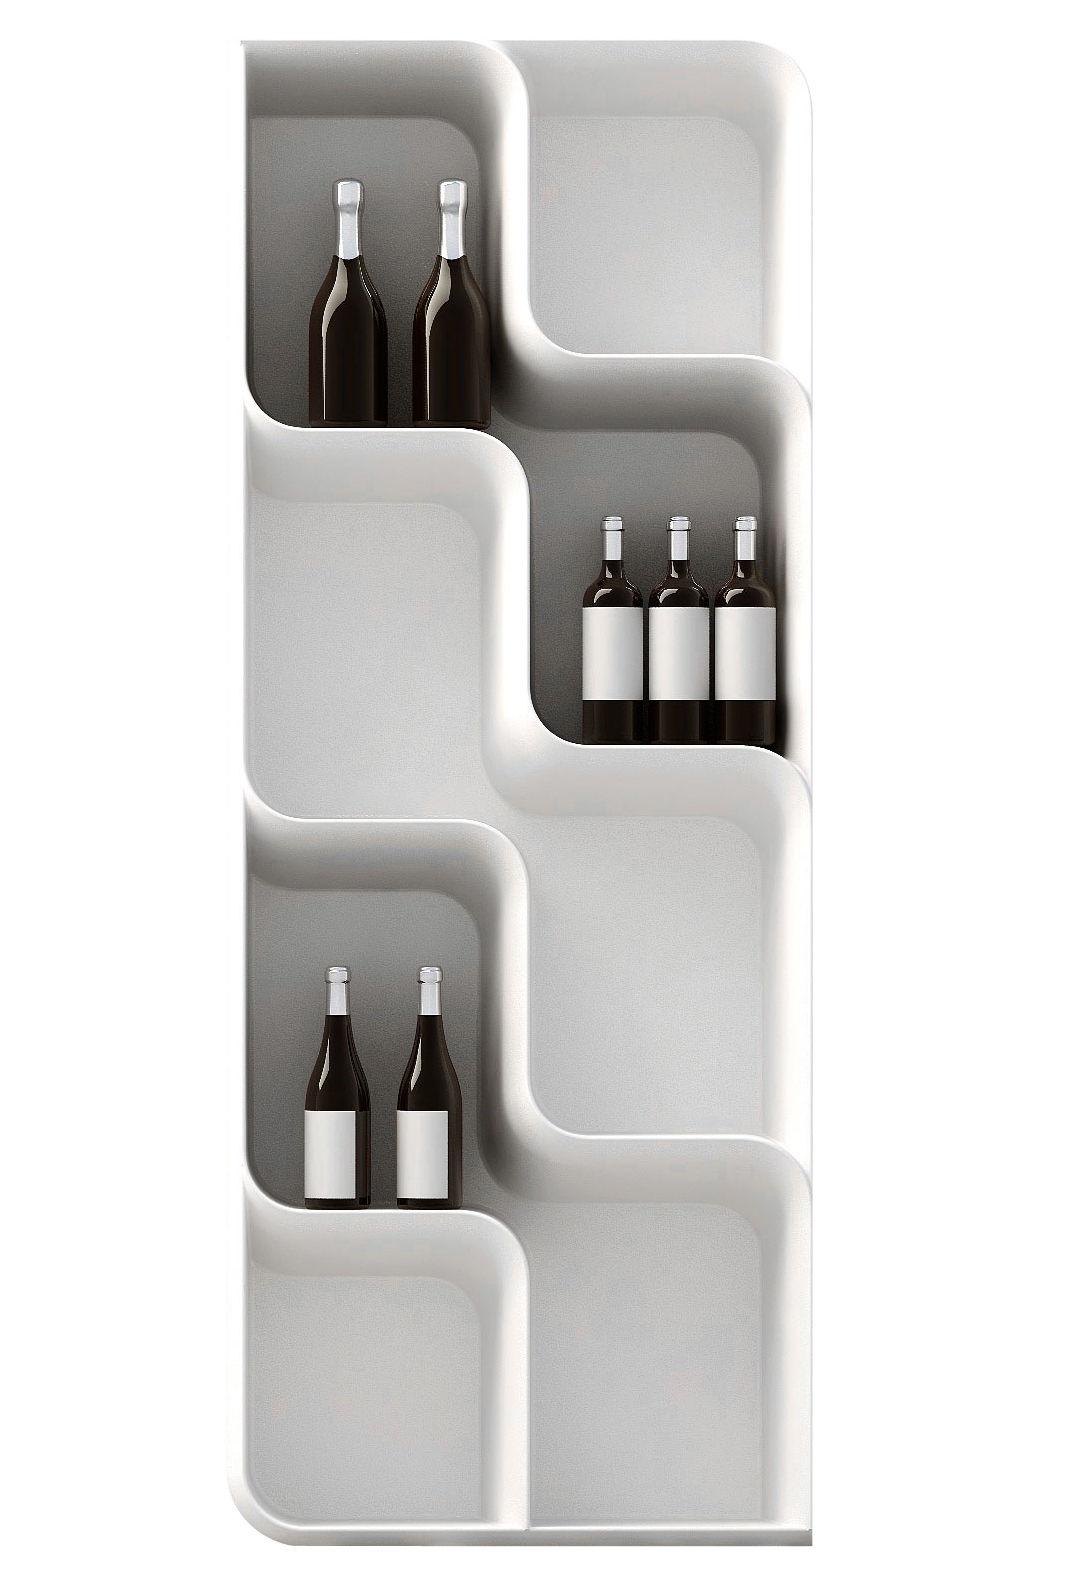 Furniture - Bookcases & Bookshelves - Baraonda Shelf by MyYour - White - Poleasy®